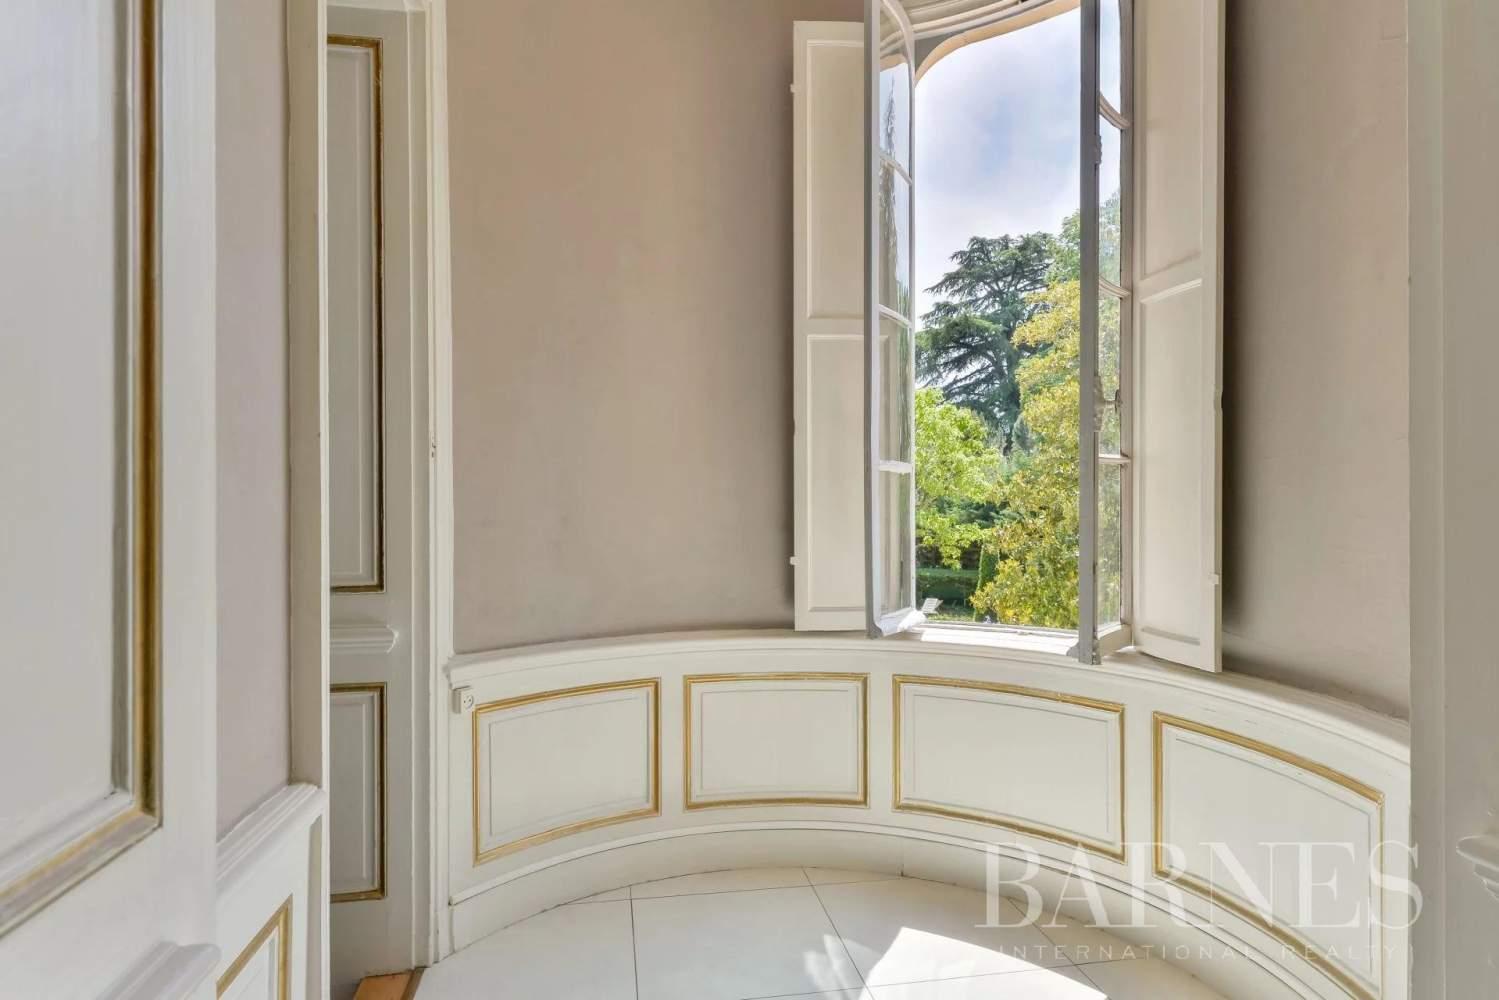 Écully  - Appartement 4 Pièces 3 Chambres - picture 5